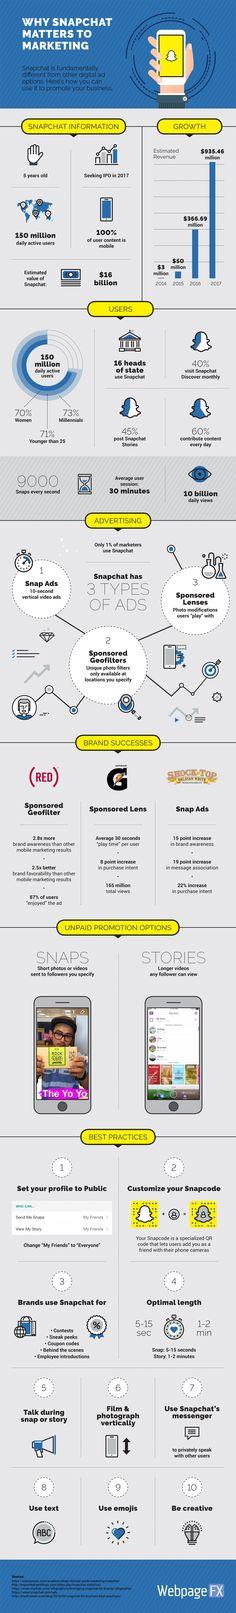 Why 2017 Is the Year to Take Snapchat Marketing Seriously #Infographic #marketing #digitalmarketing #socialmedia #snapchat